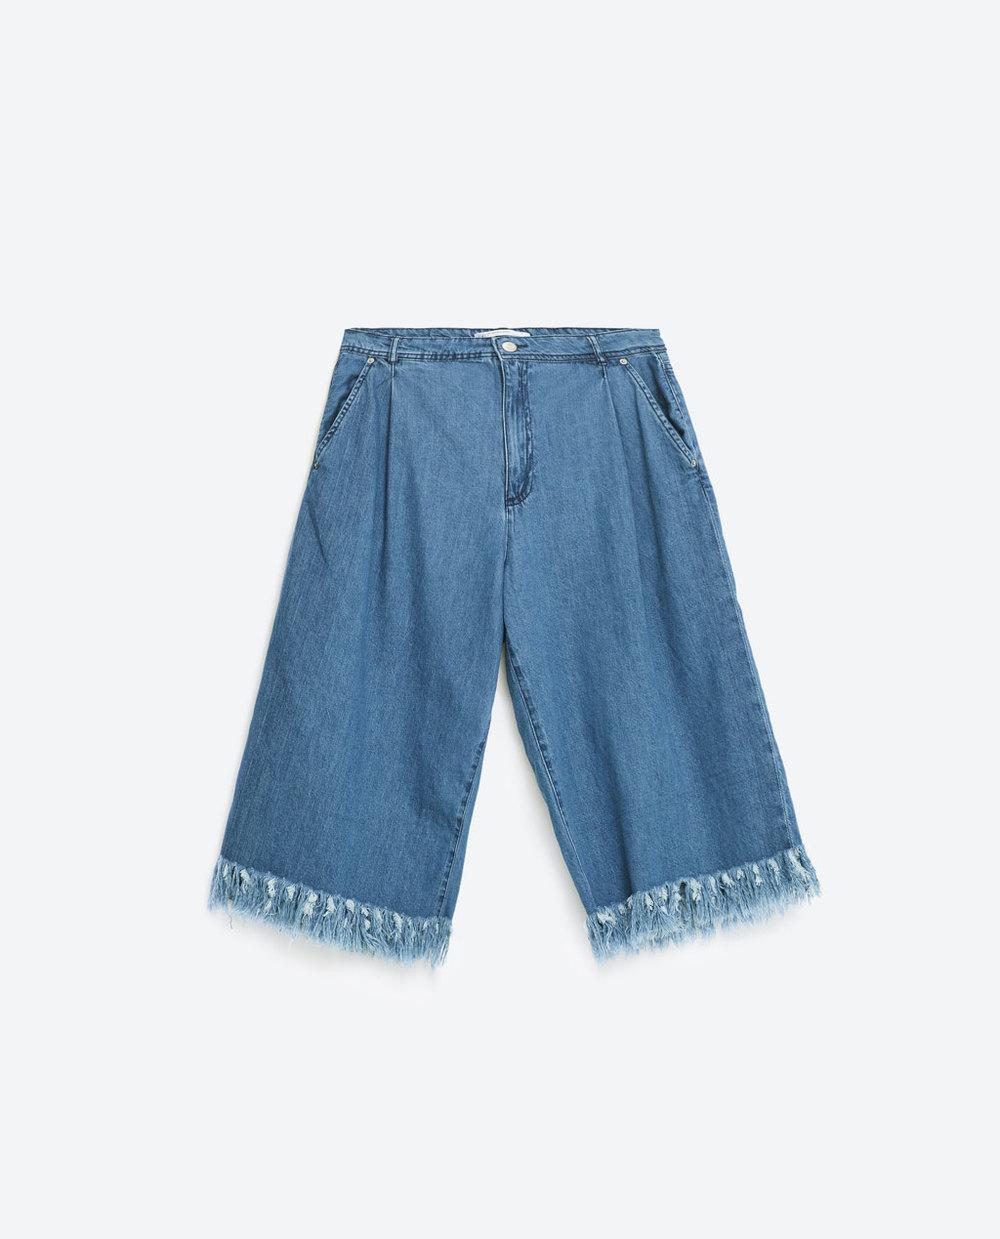 Zara -45,90$C